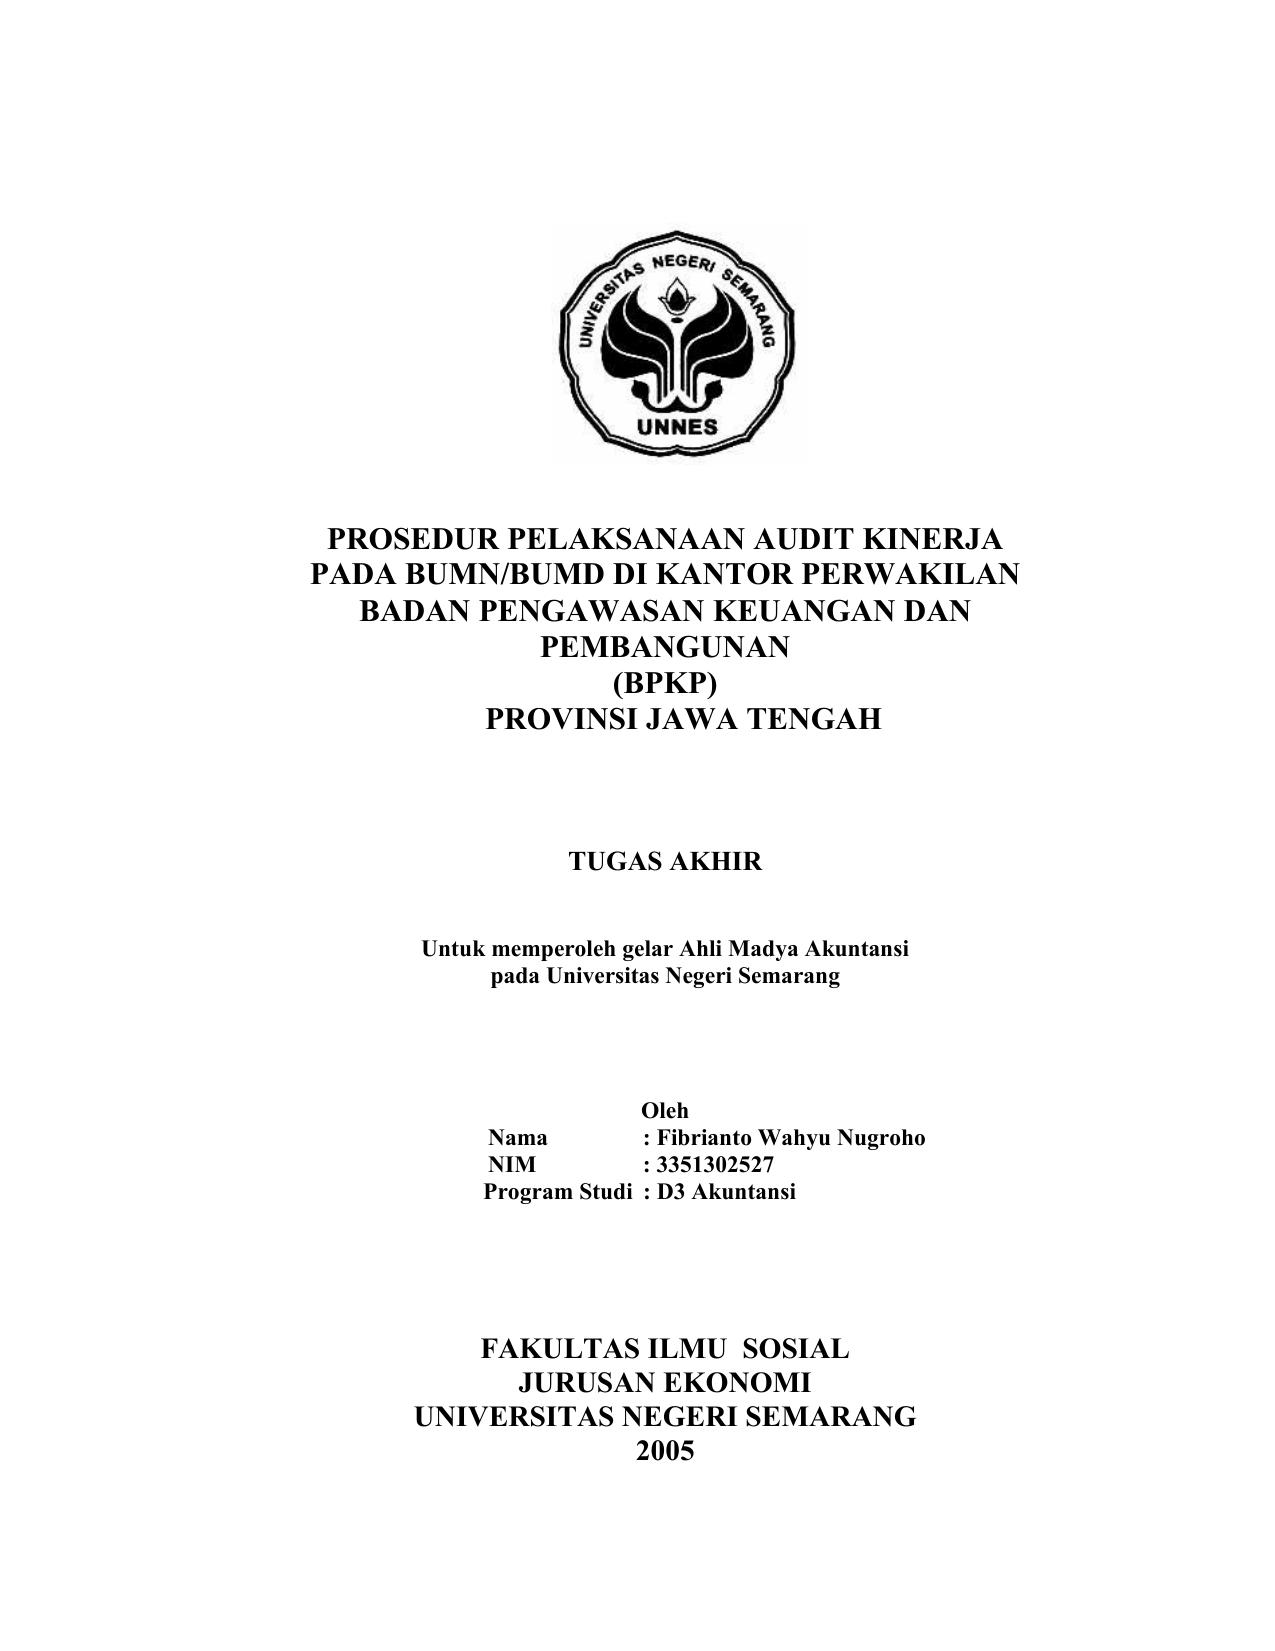 Contoh Tugas Akhir D3 Akuntansi Keuangan Guru Paud